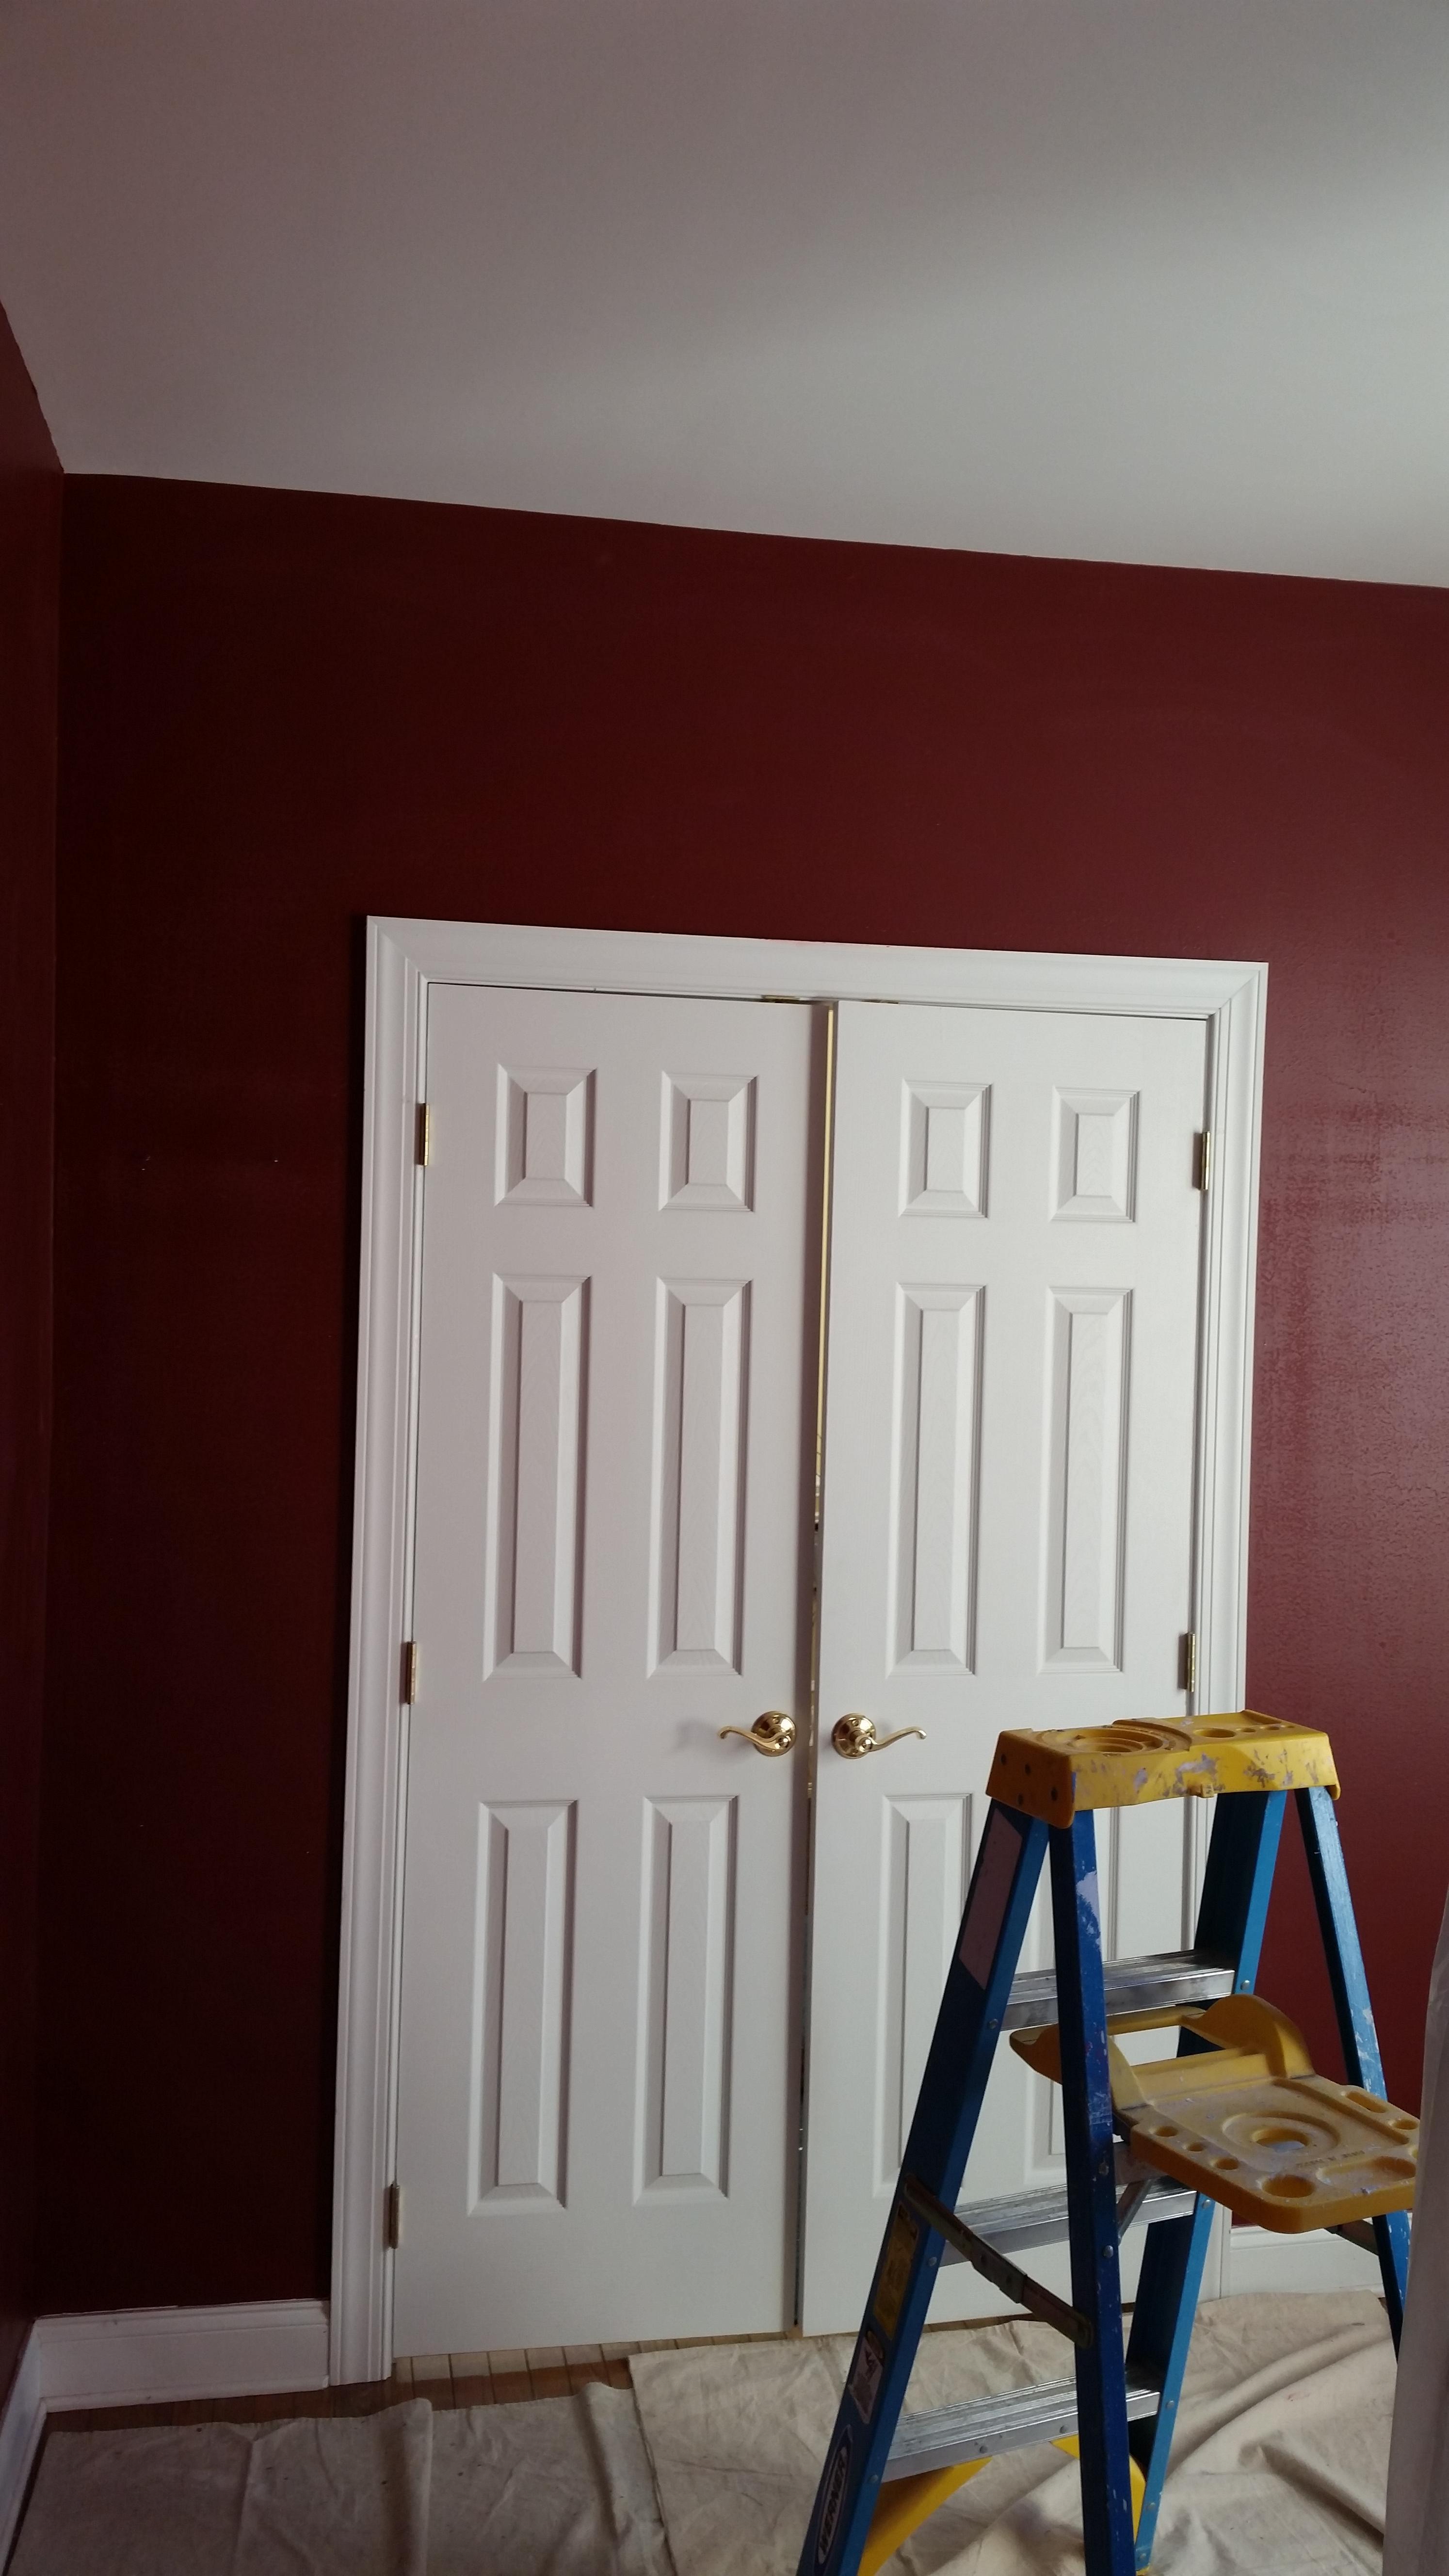 Lv Painting, LLC image 2